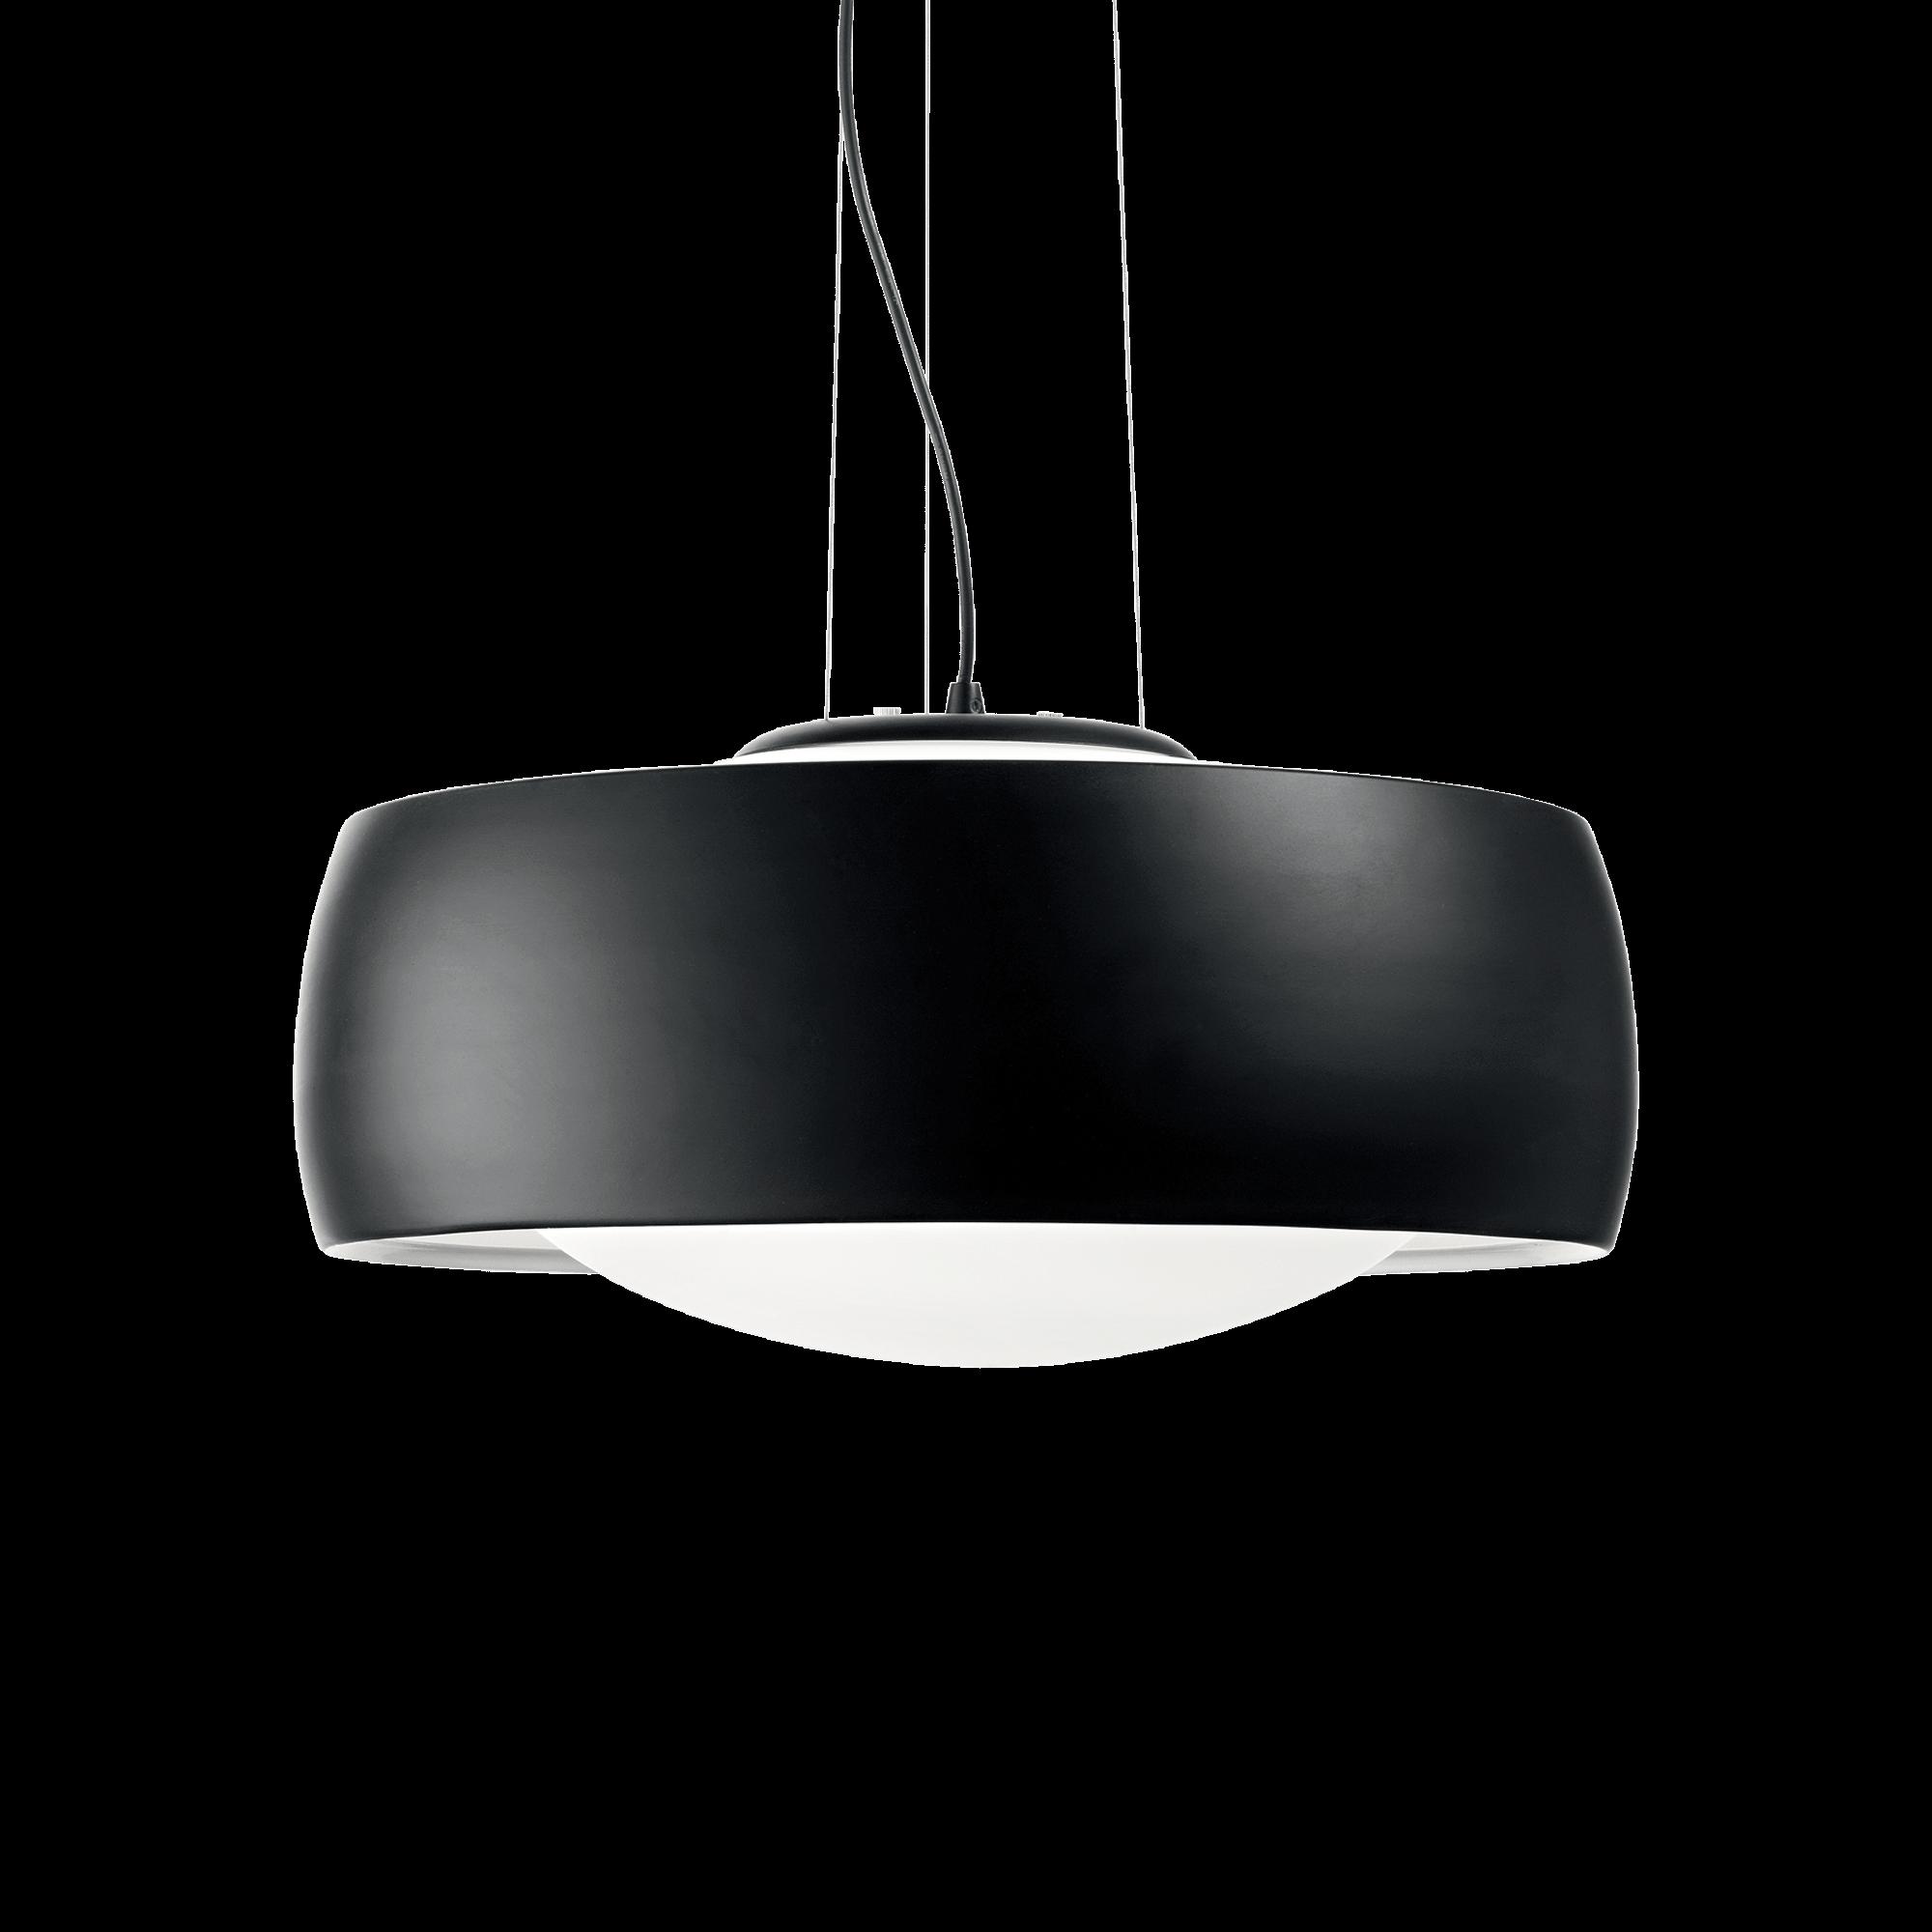 Ideal Lux 186832 COMFORT SP1 NERO függeszték